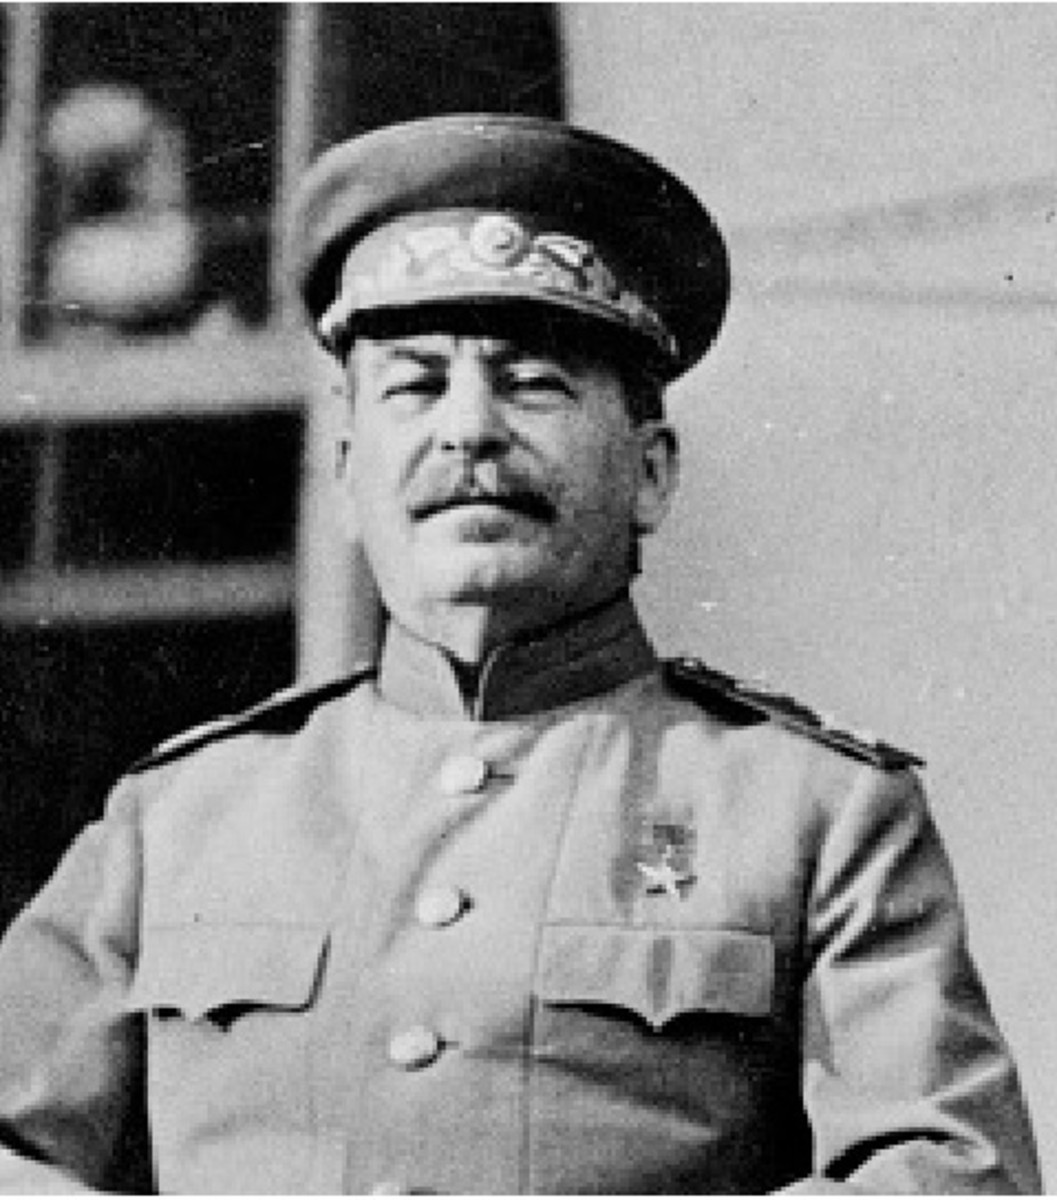 Soviet Dictator Joseph Stalin (Ио́сиф Виссарио́нович Ста́лин)